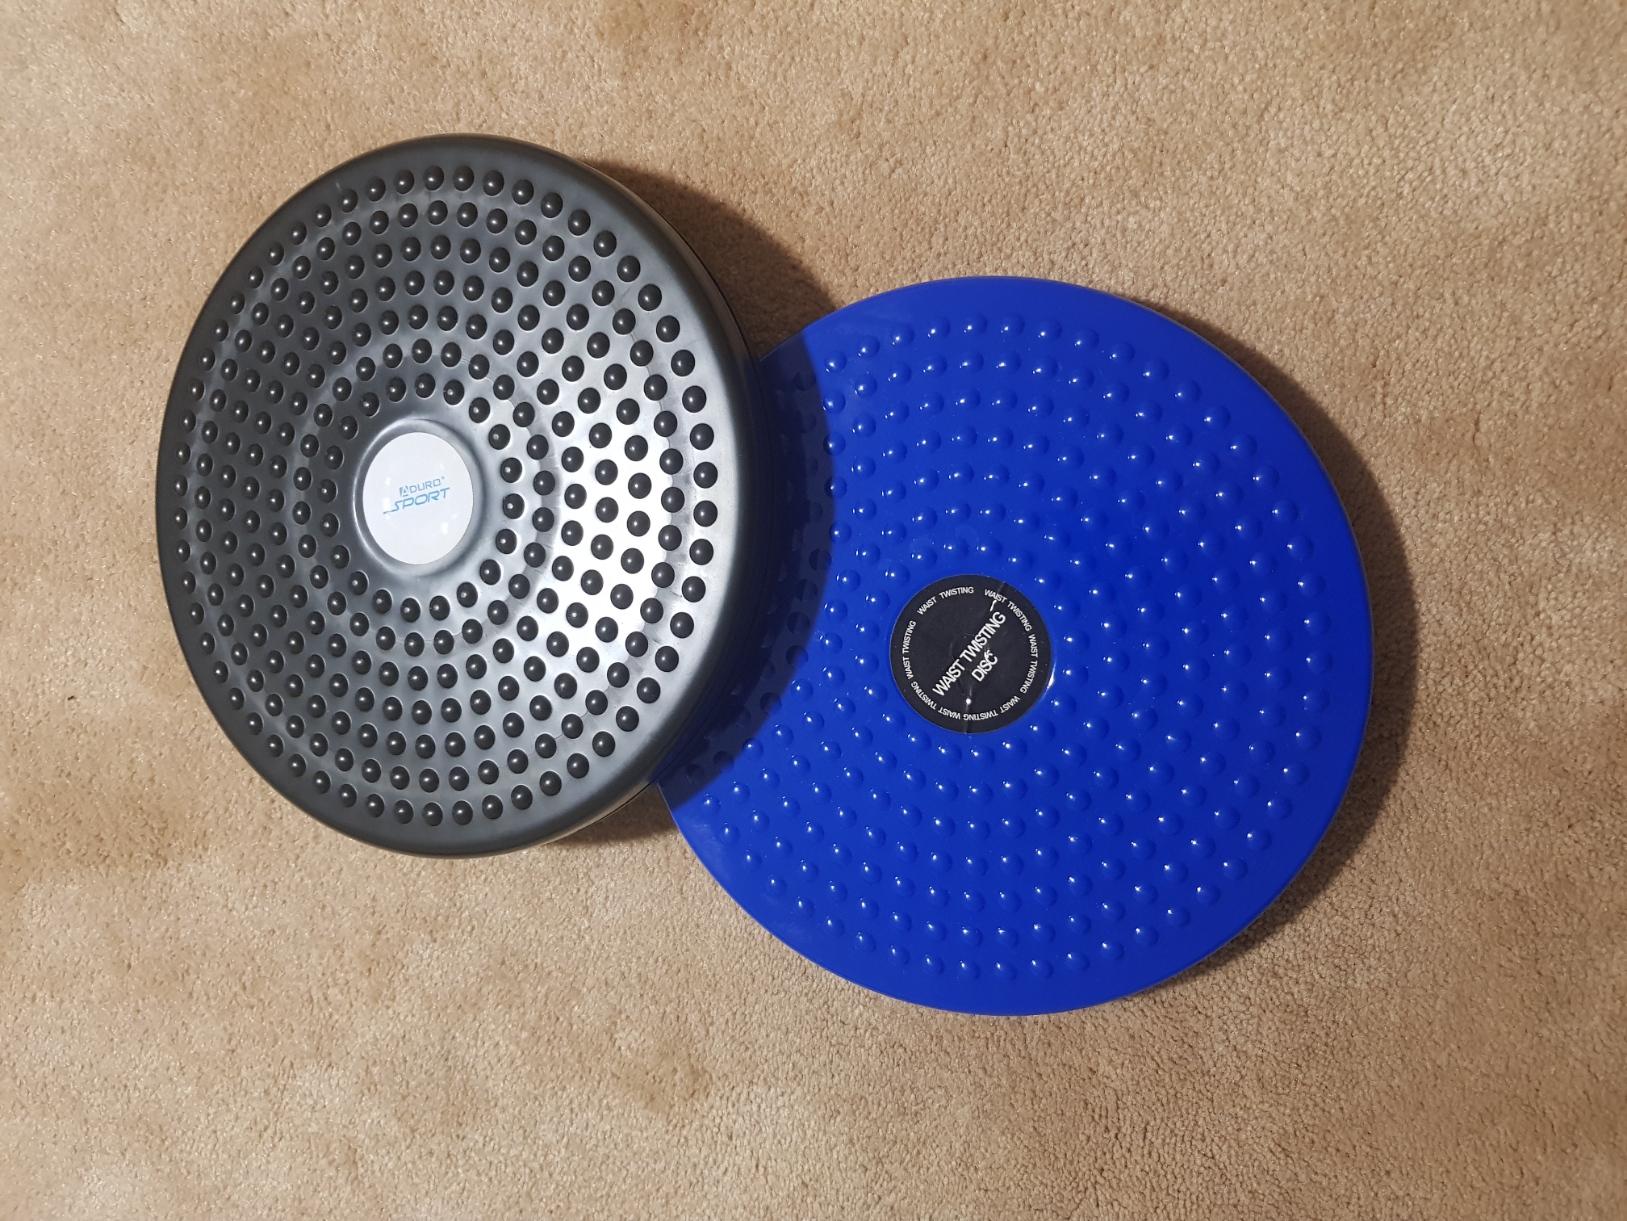 Twisting Disk